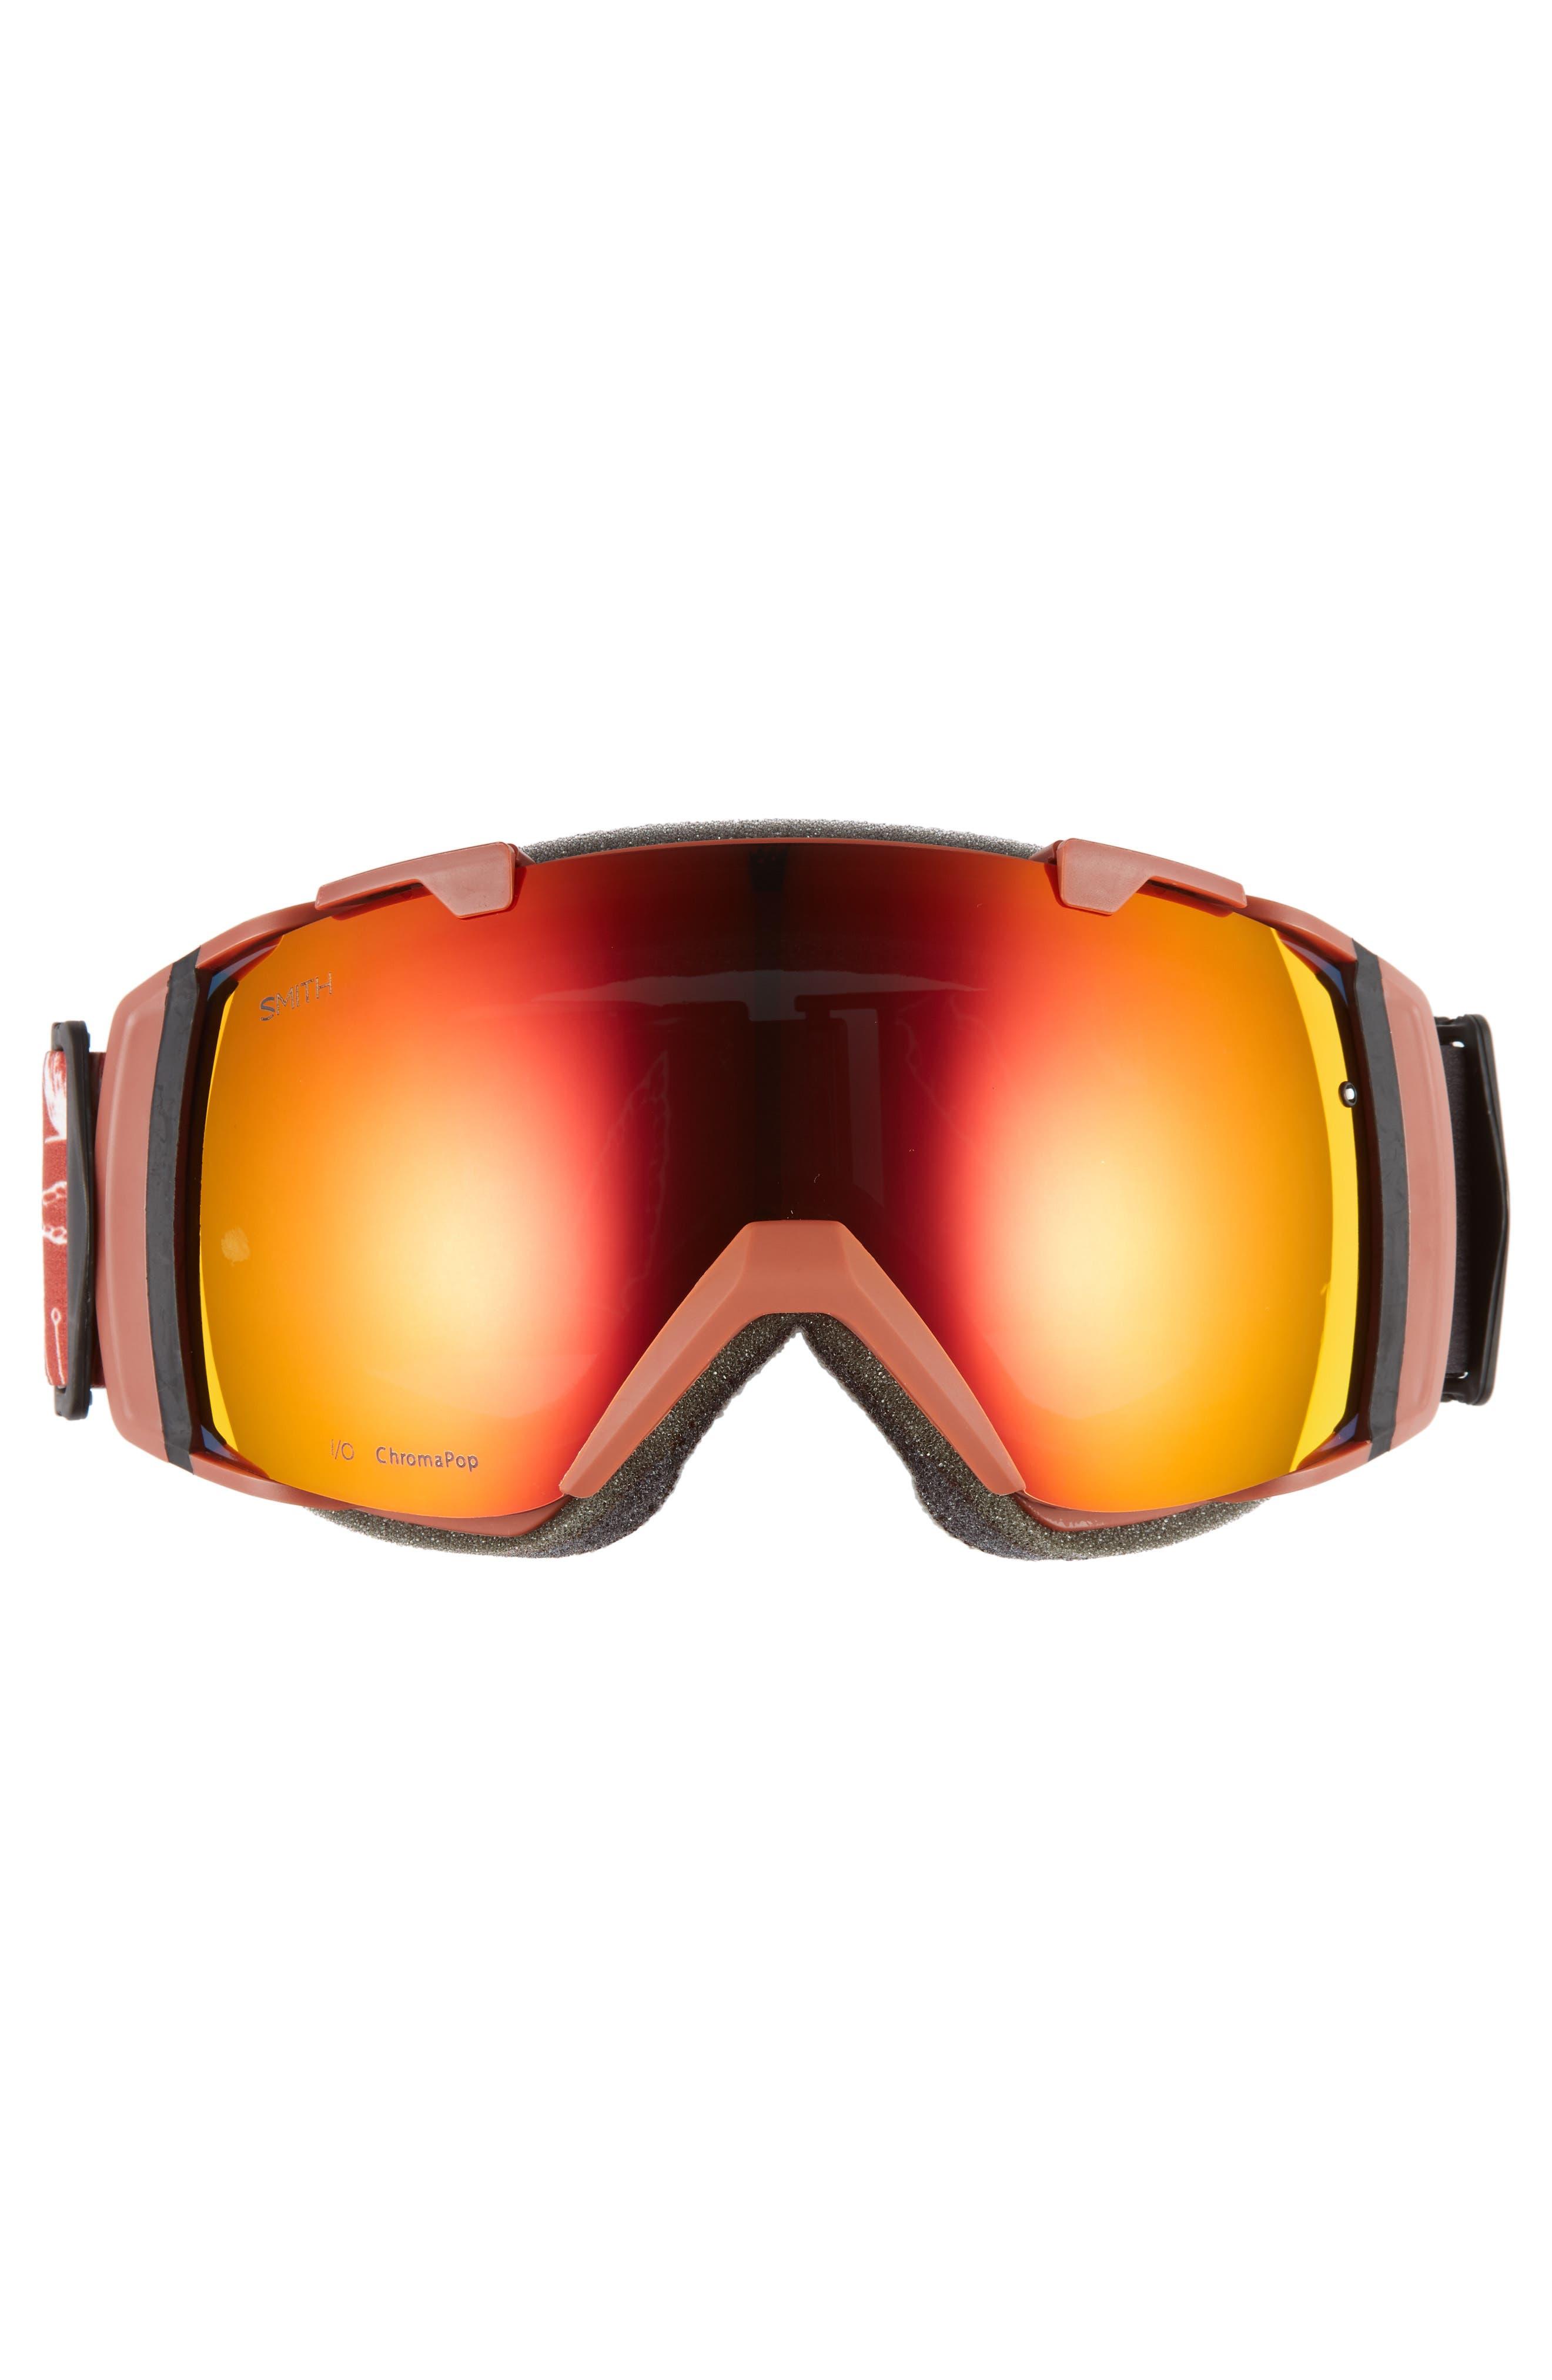 I/O 215mm ChromaPop Snow Goggles,                             Alternate thumbnail 2, color,                             OXIDE MOJAVE